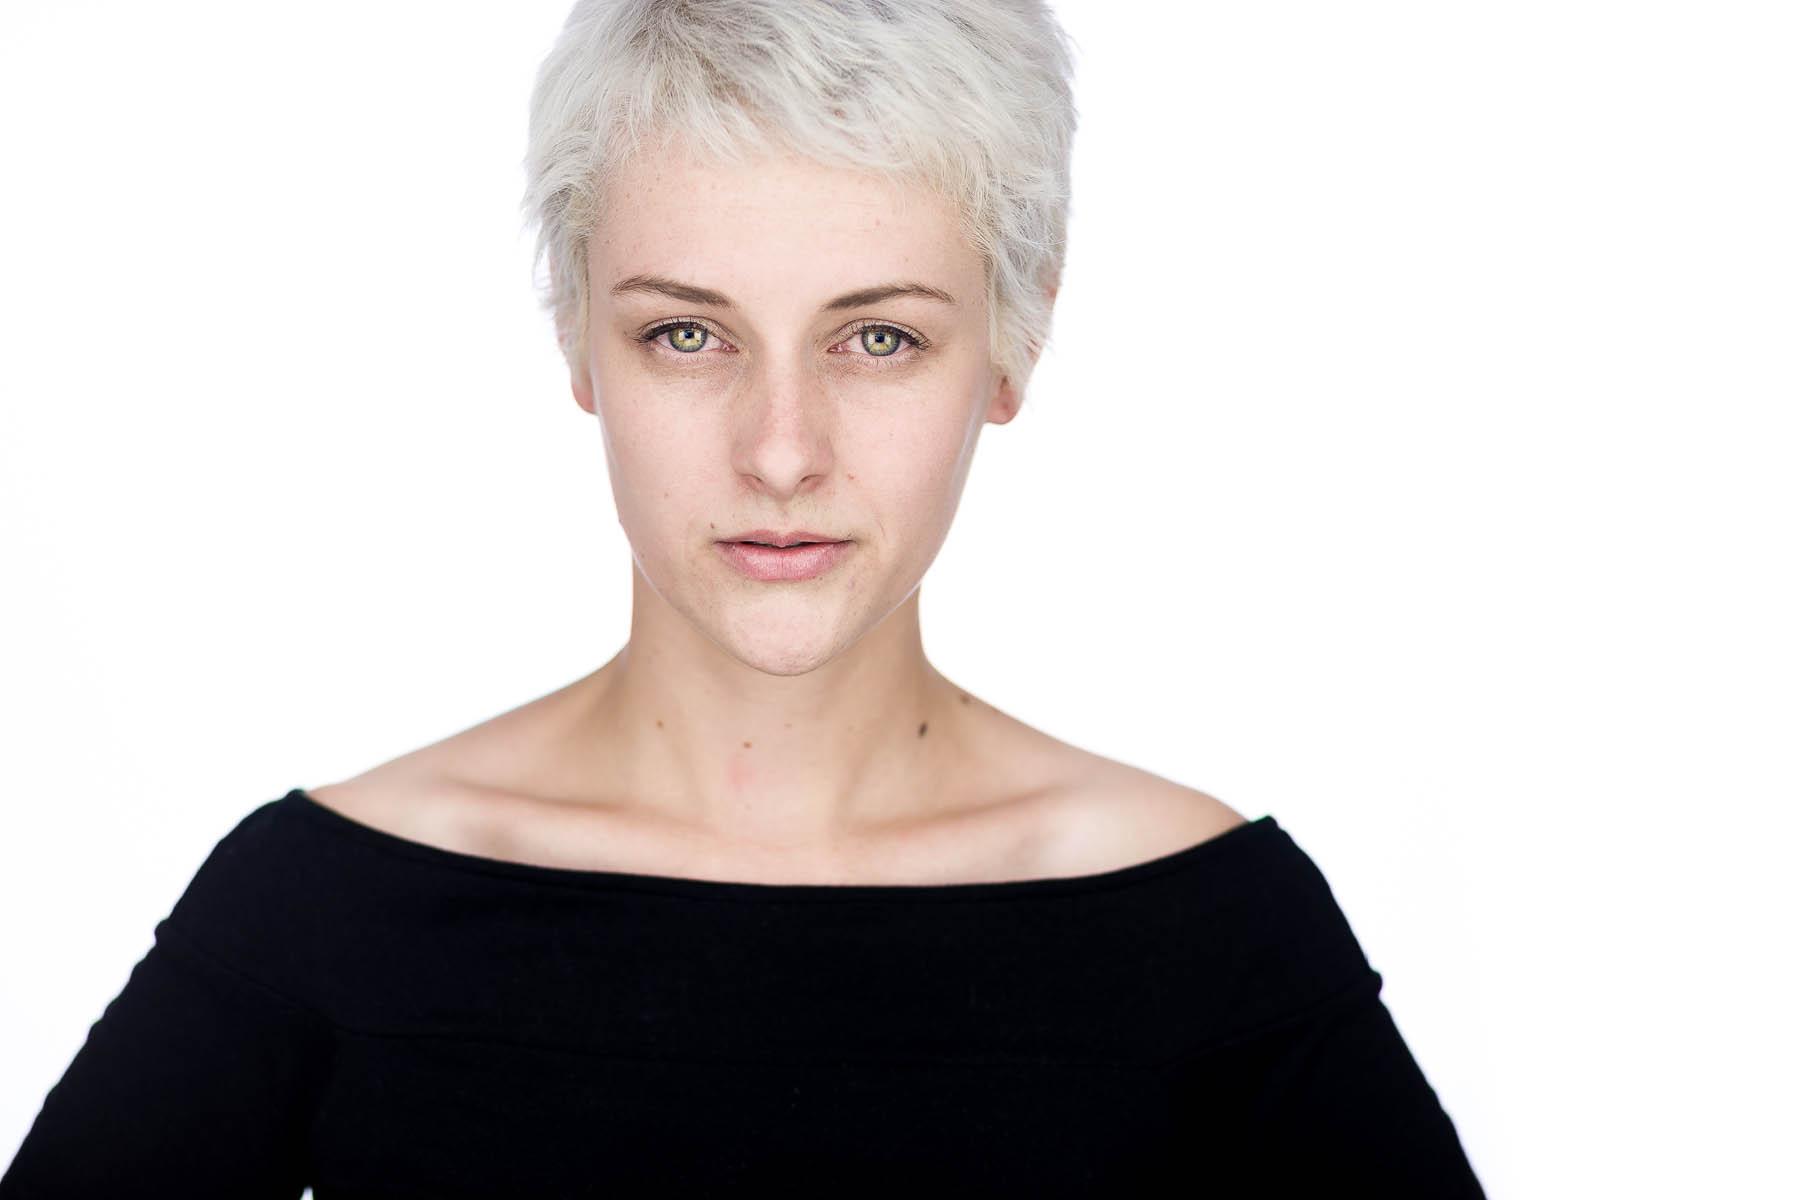 sarah-actor-professional-headshot-session-25.jpg